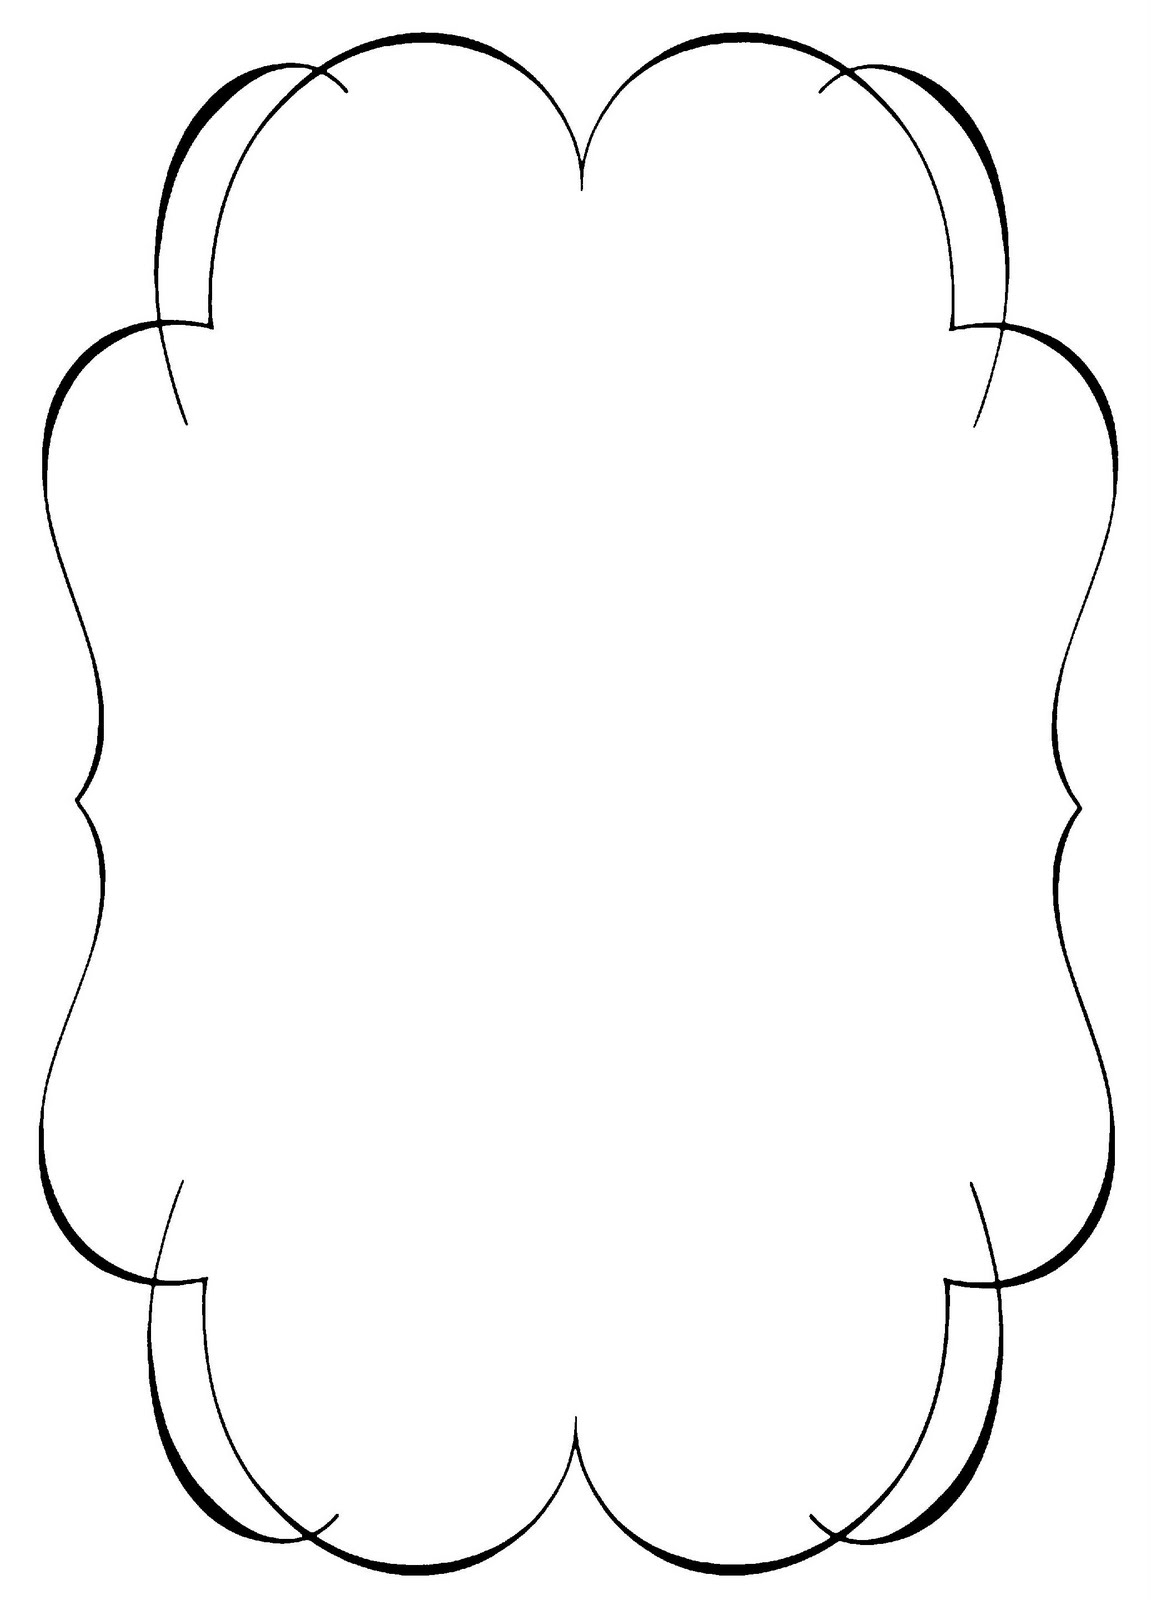 Simple Corner Borders Clip Art | Free Vintage Clip Art - Elegant